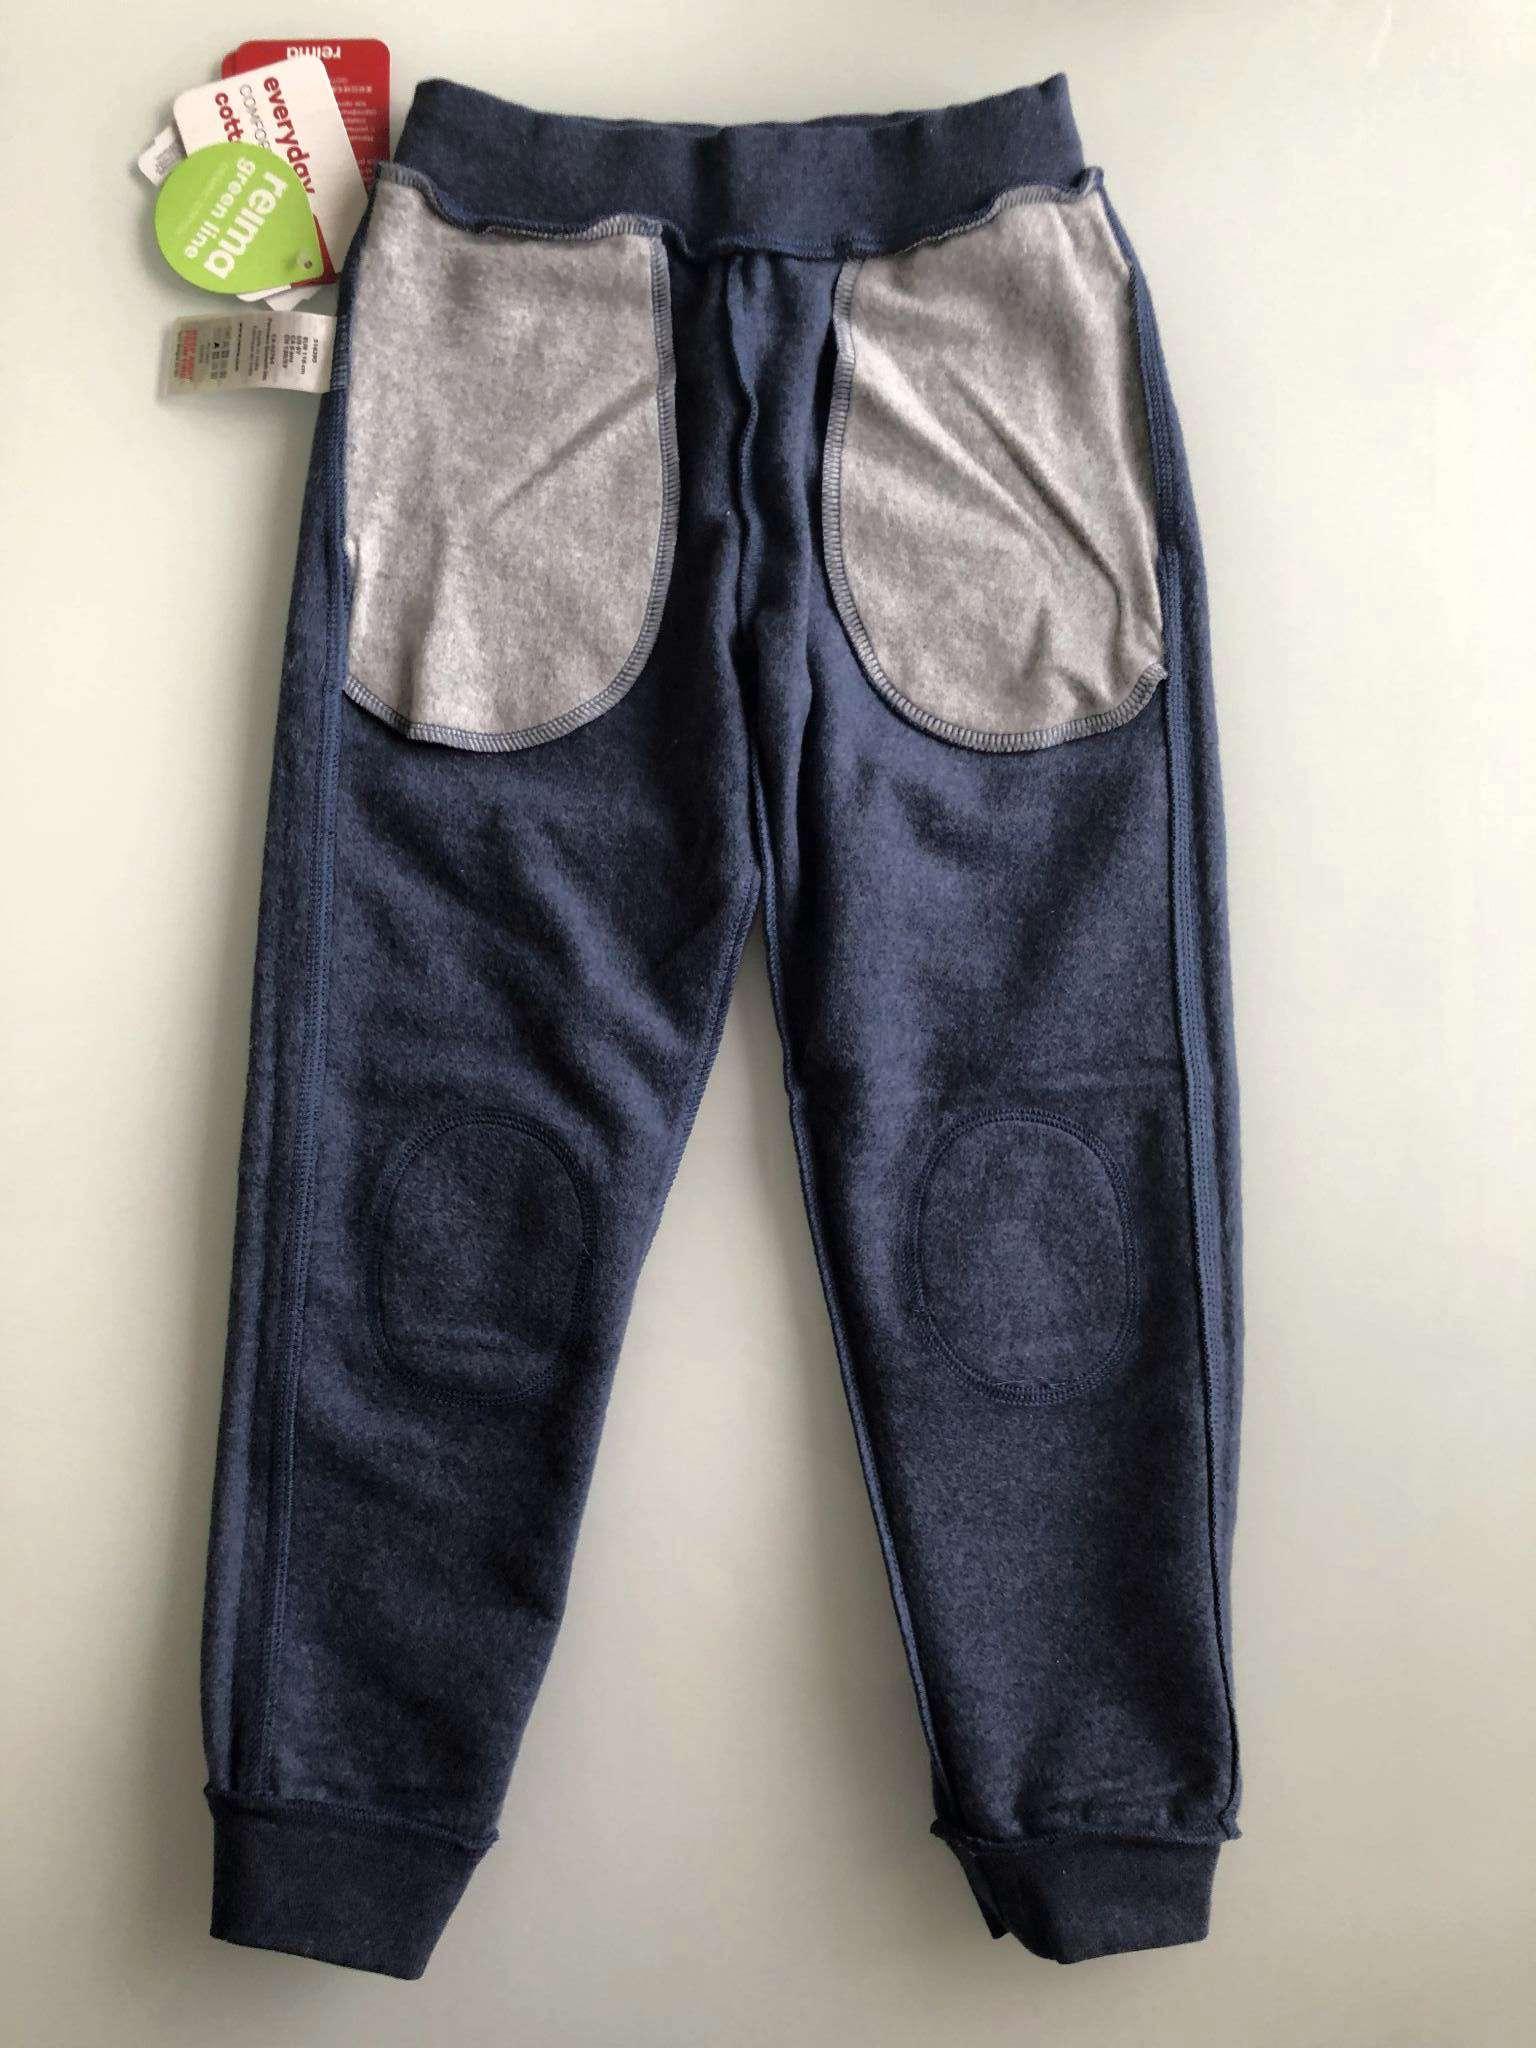 d9e2d0871bbd Брюки REIMA 516395-6790-116 для мальчика, цвет синий, размер 116 ...